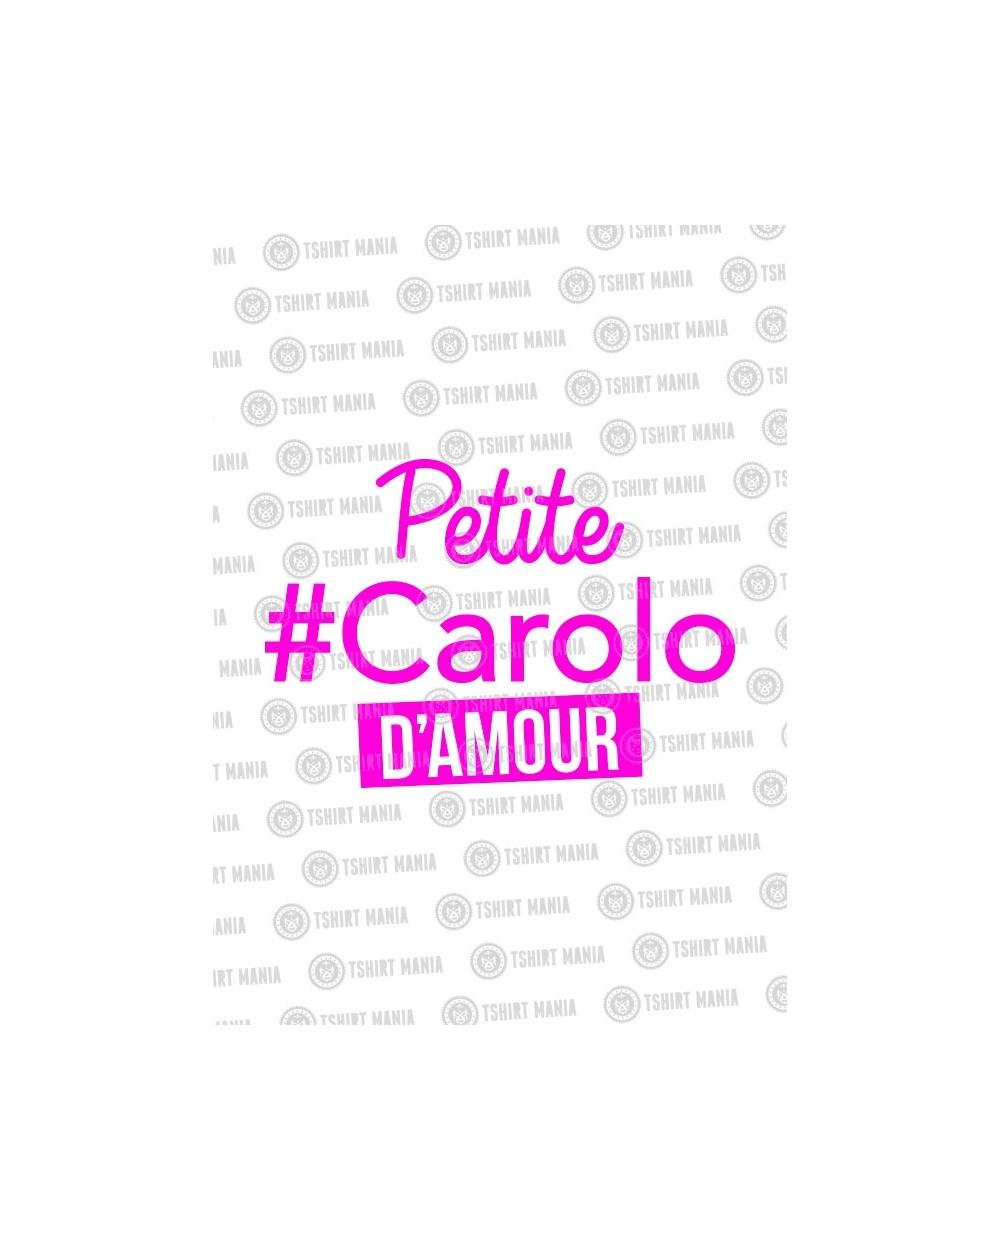 Petite Carolo D'amour tshirt